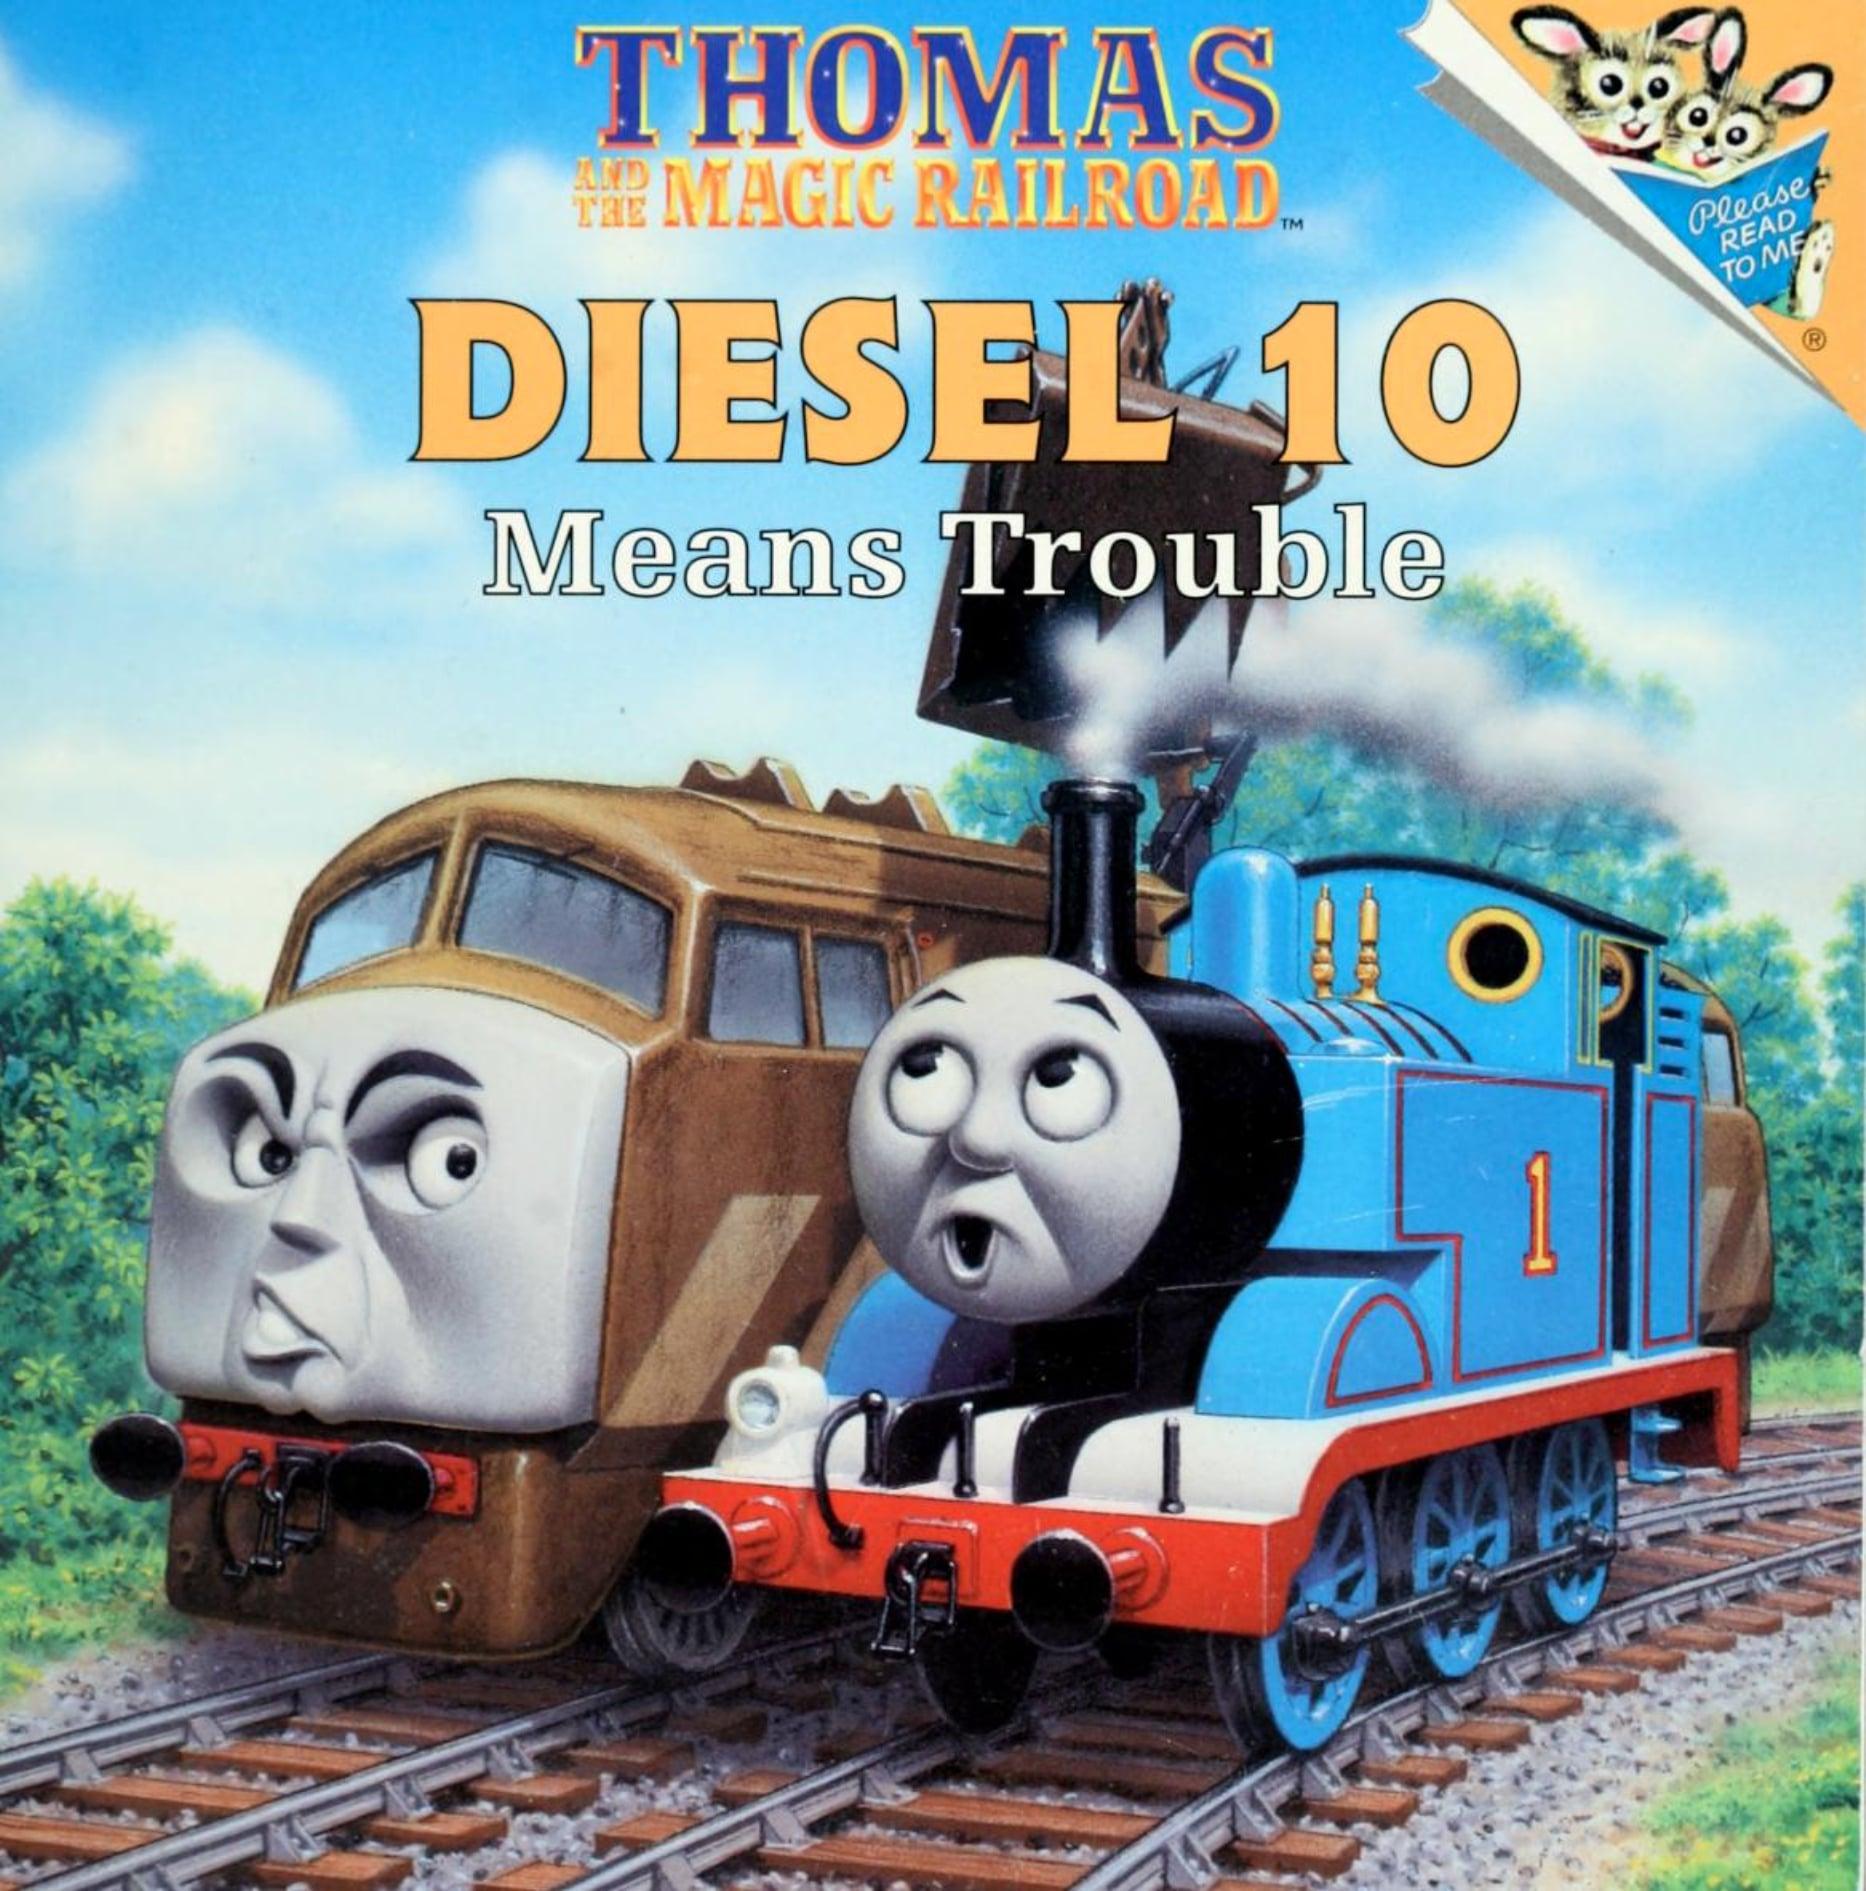 Diesel 10 Means Trouble